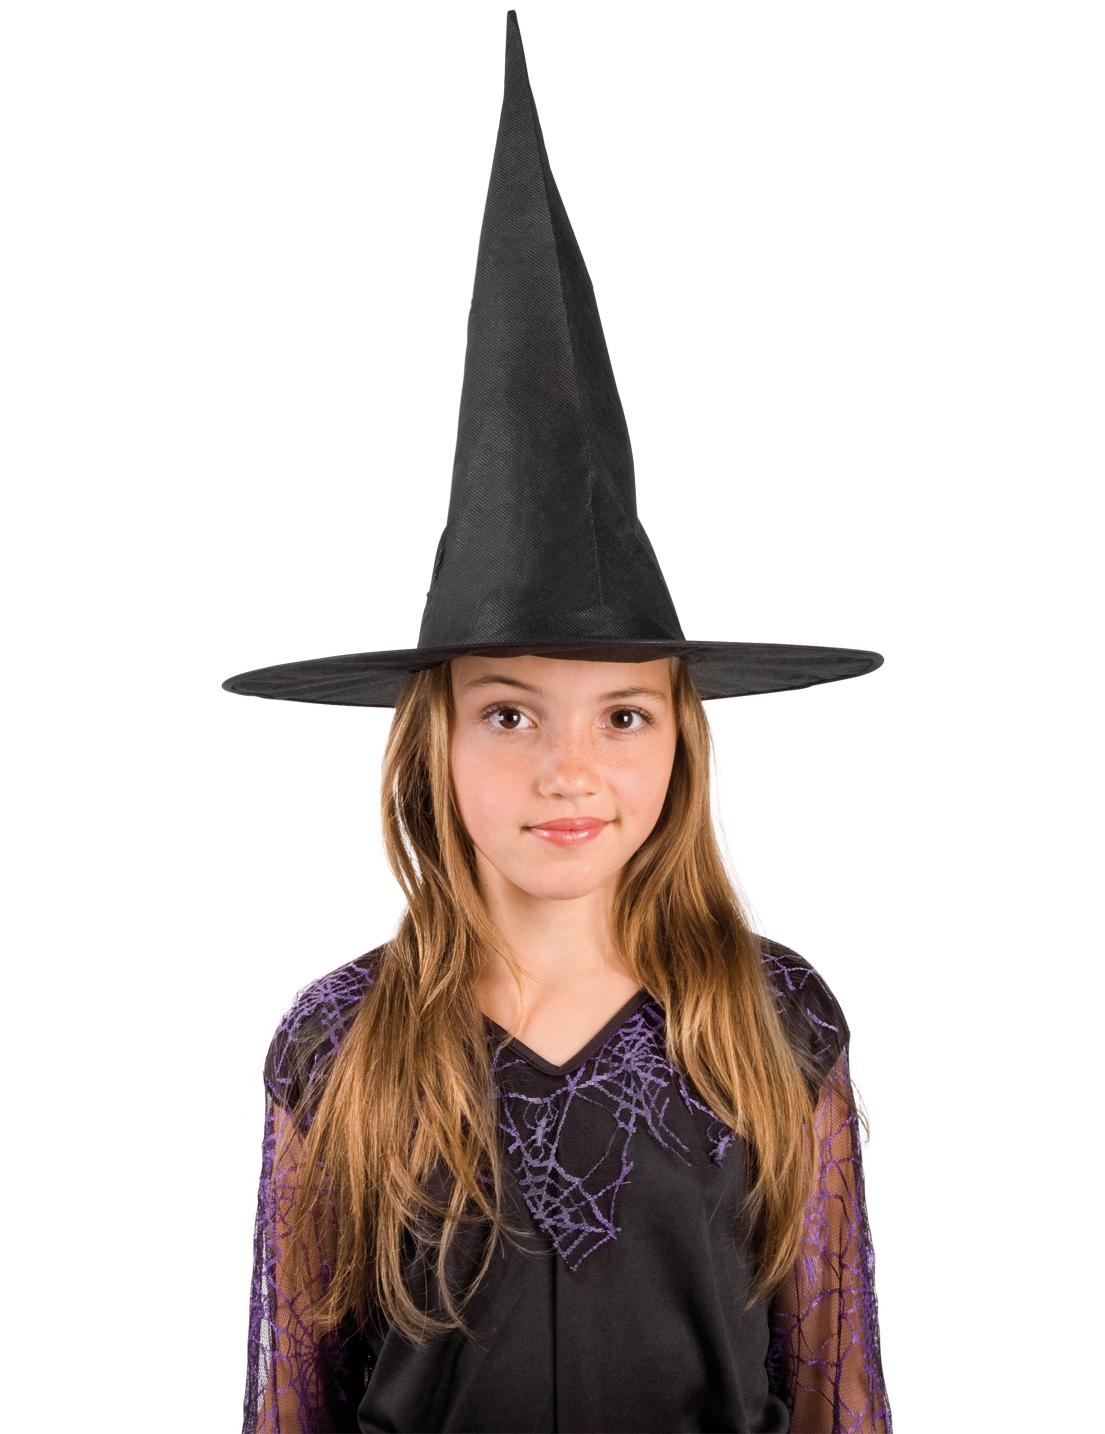 Sombrero de bruja para niña ideal Halloween dda3857f7d0